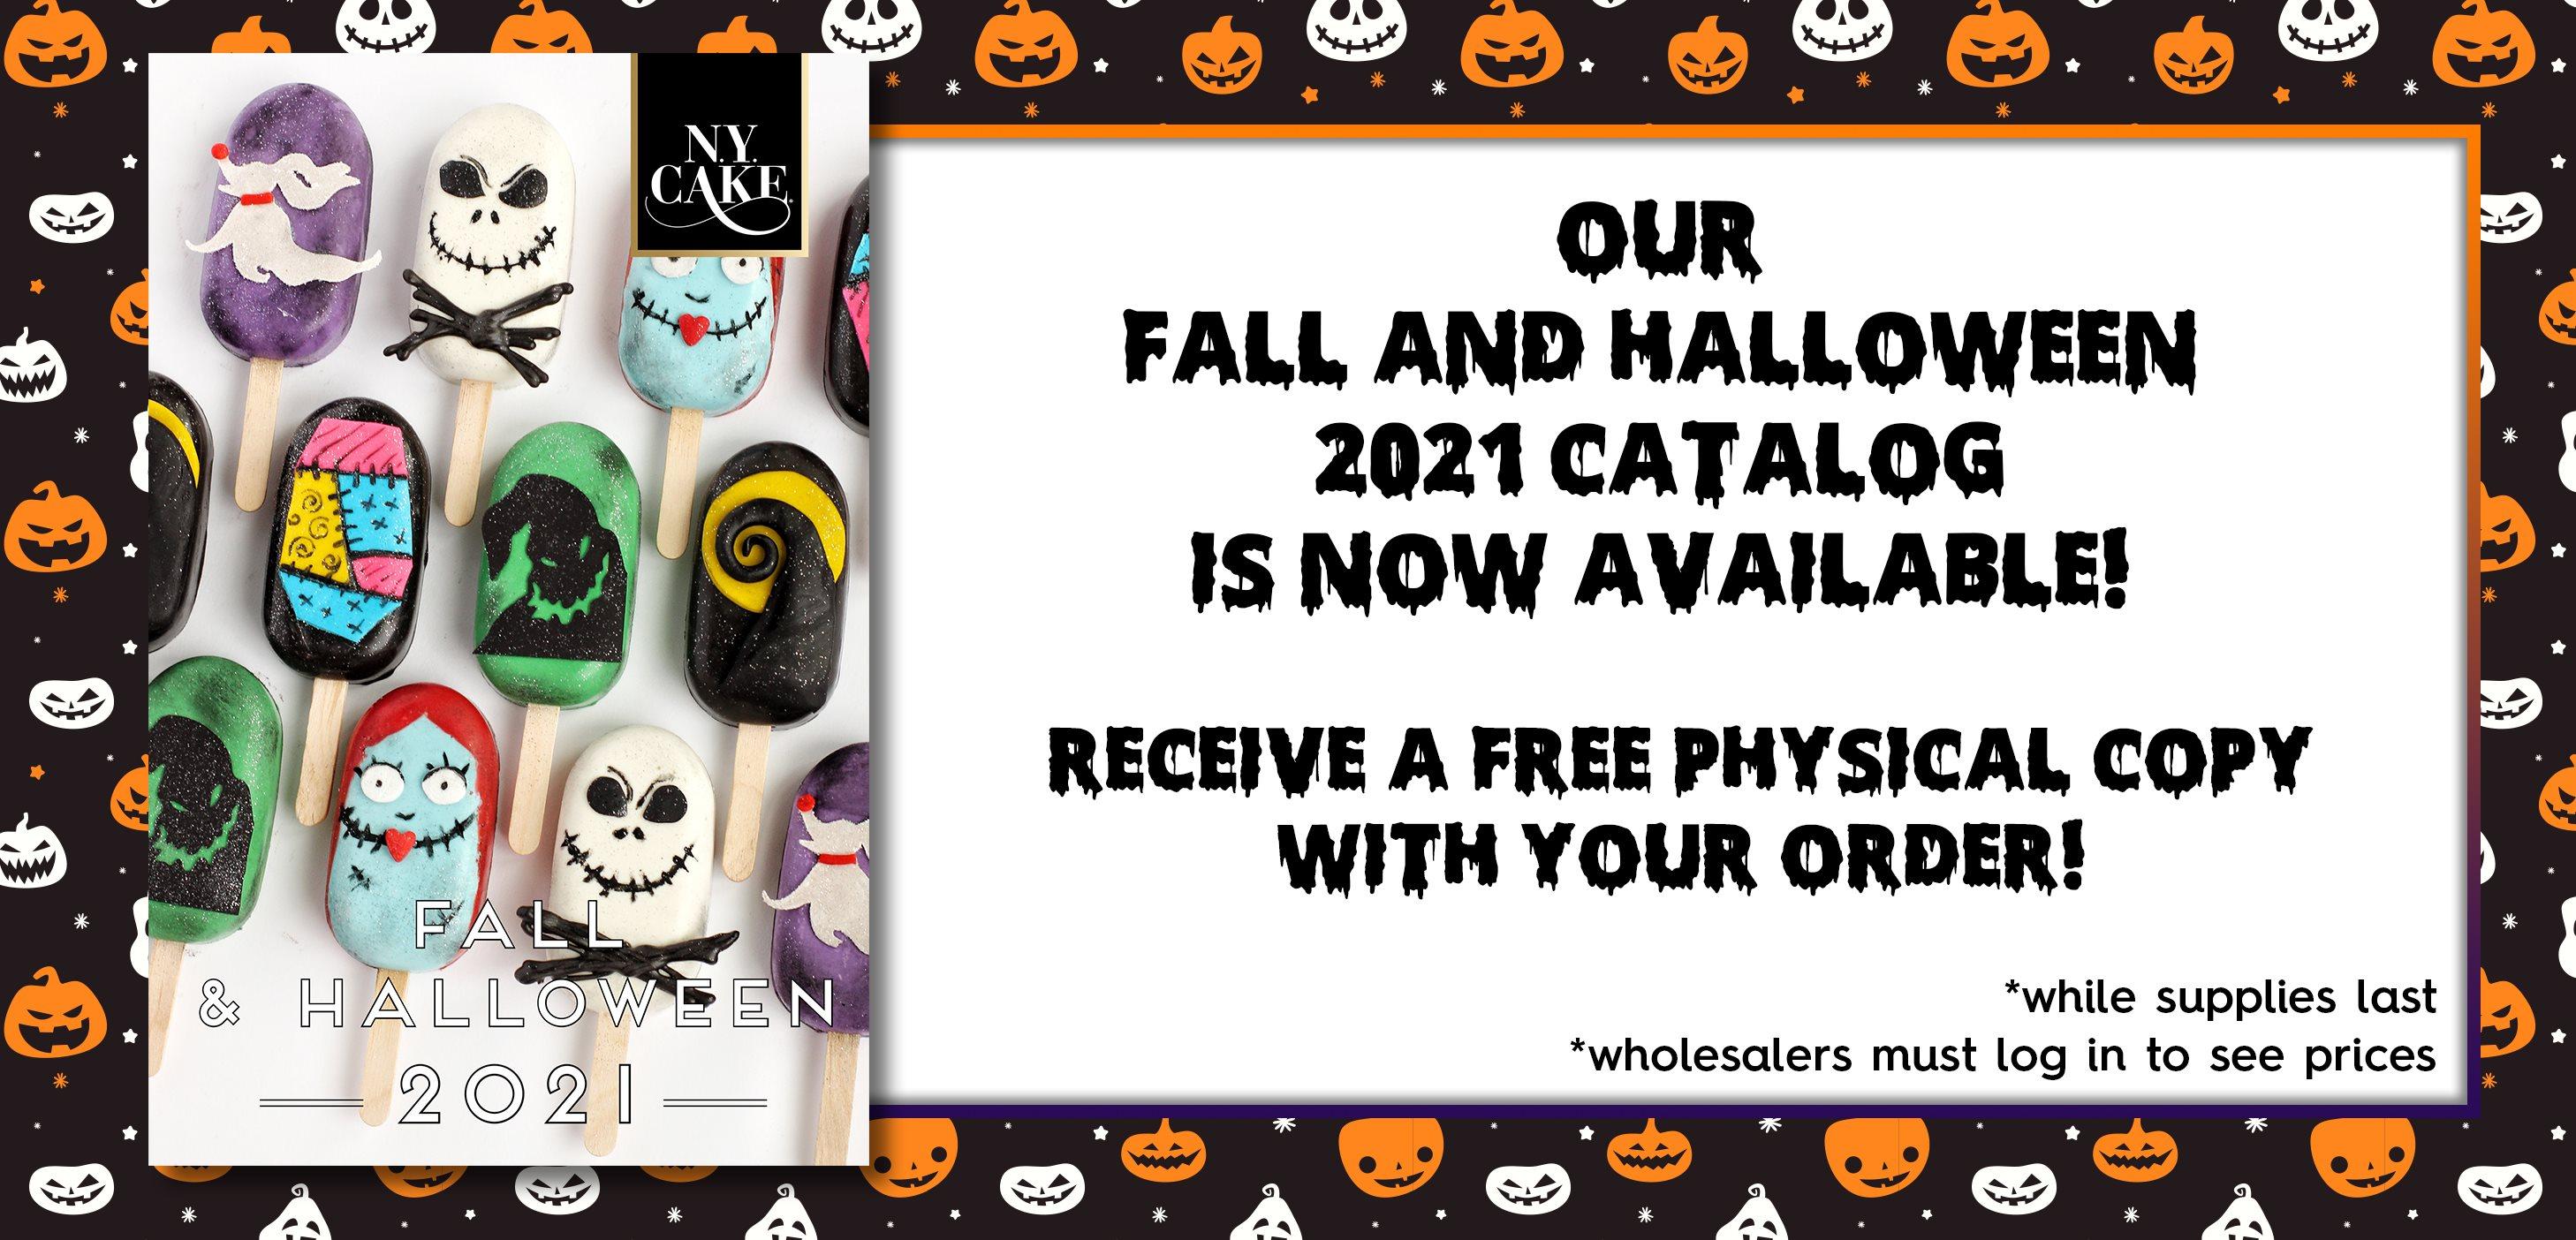 Fall Halloween Product Catalog 2021